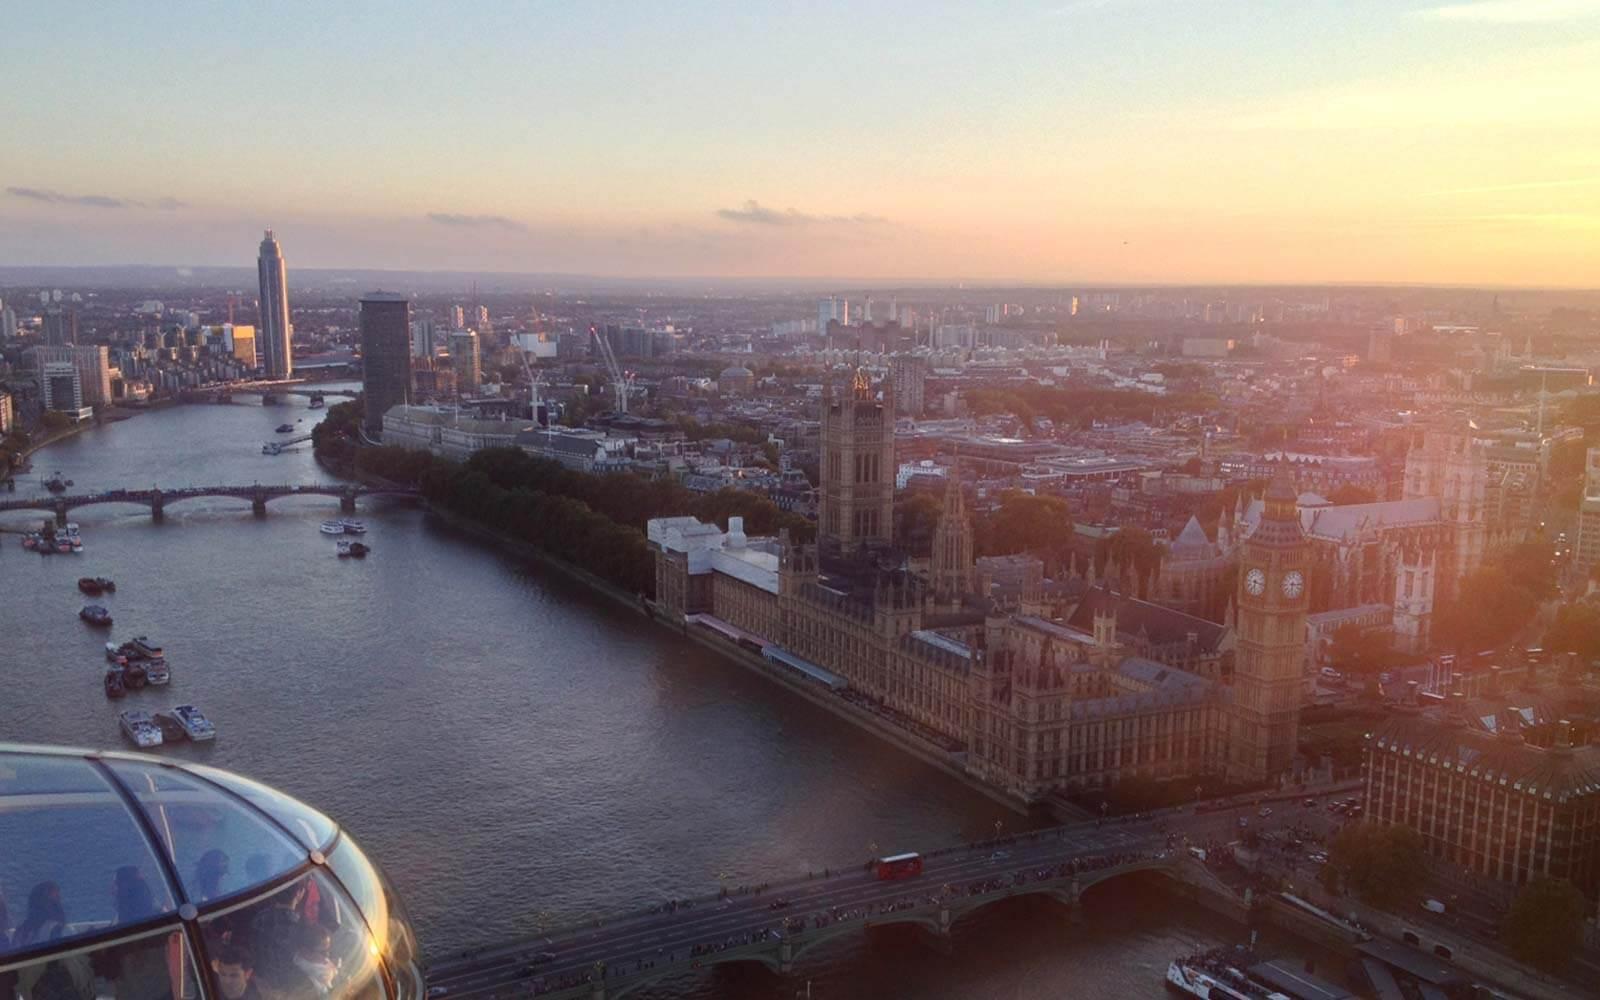 Fahrt mit dem London Eye zum Sonnenuntergang